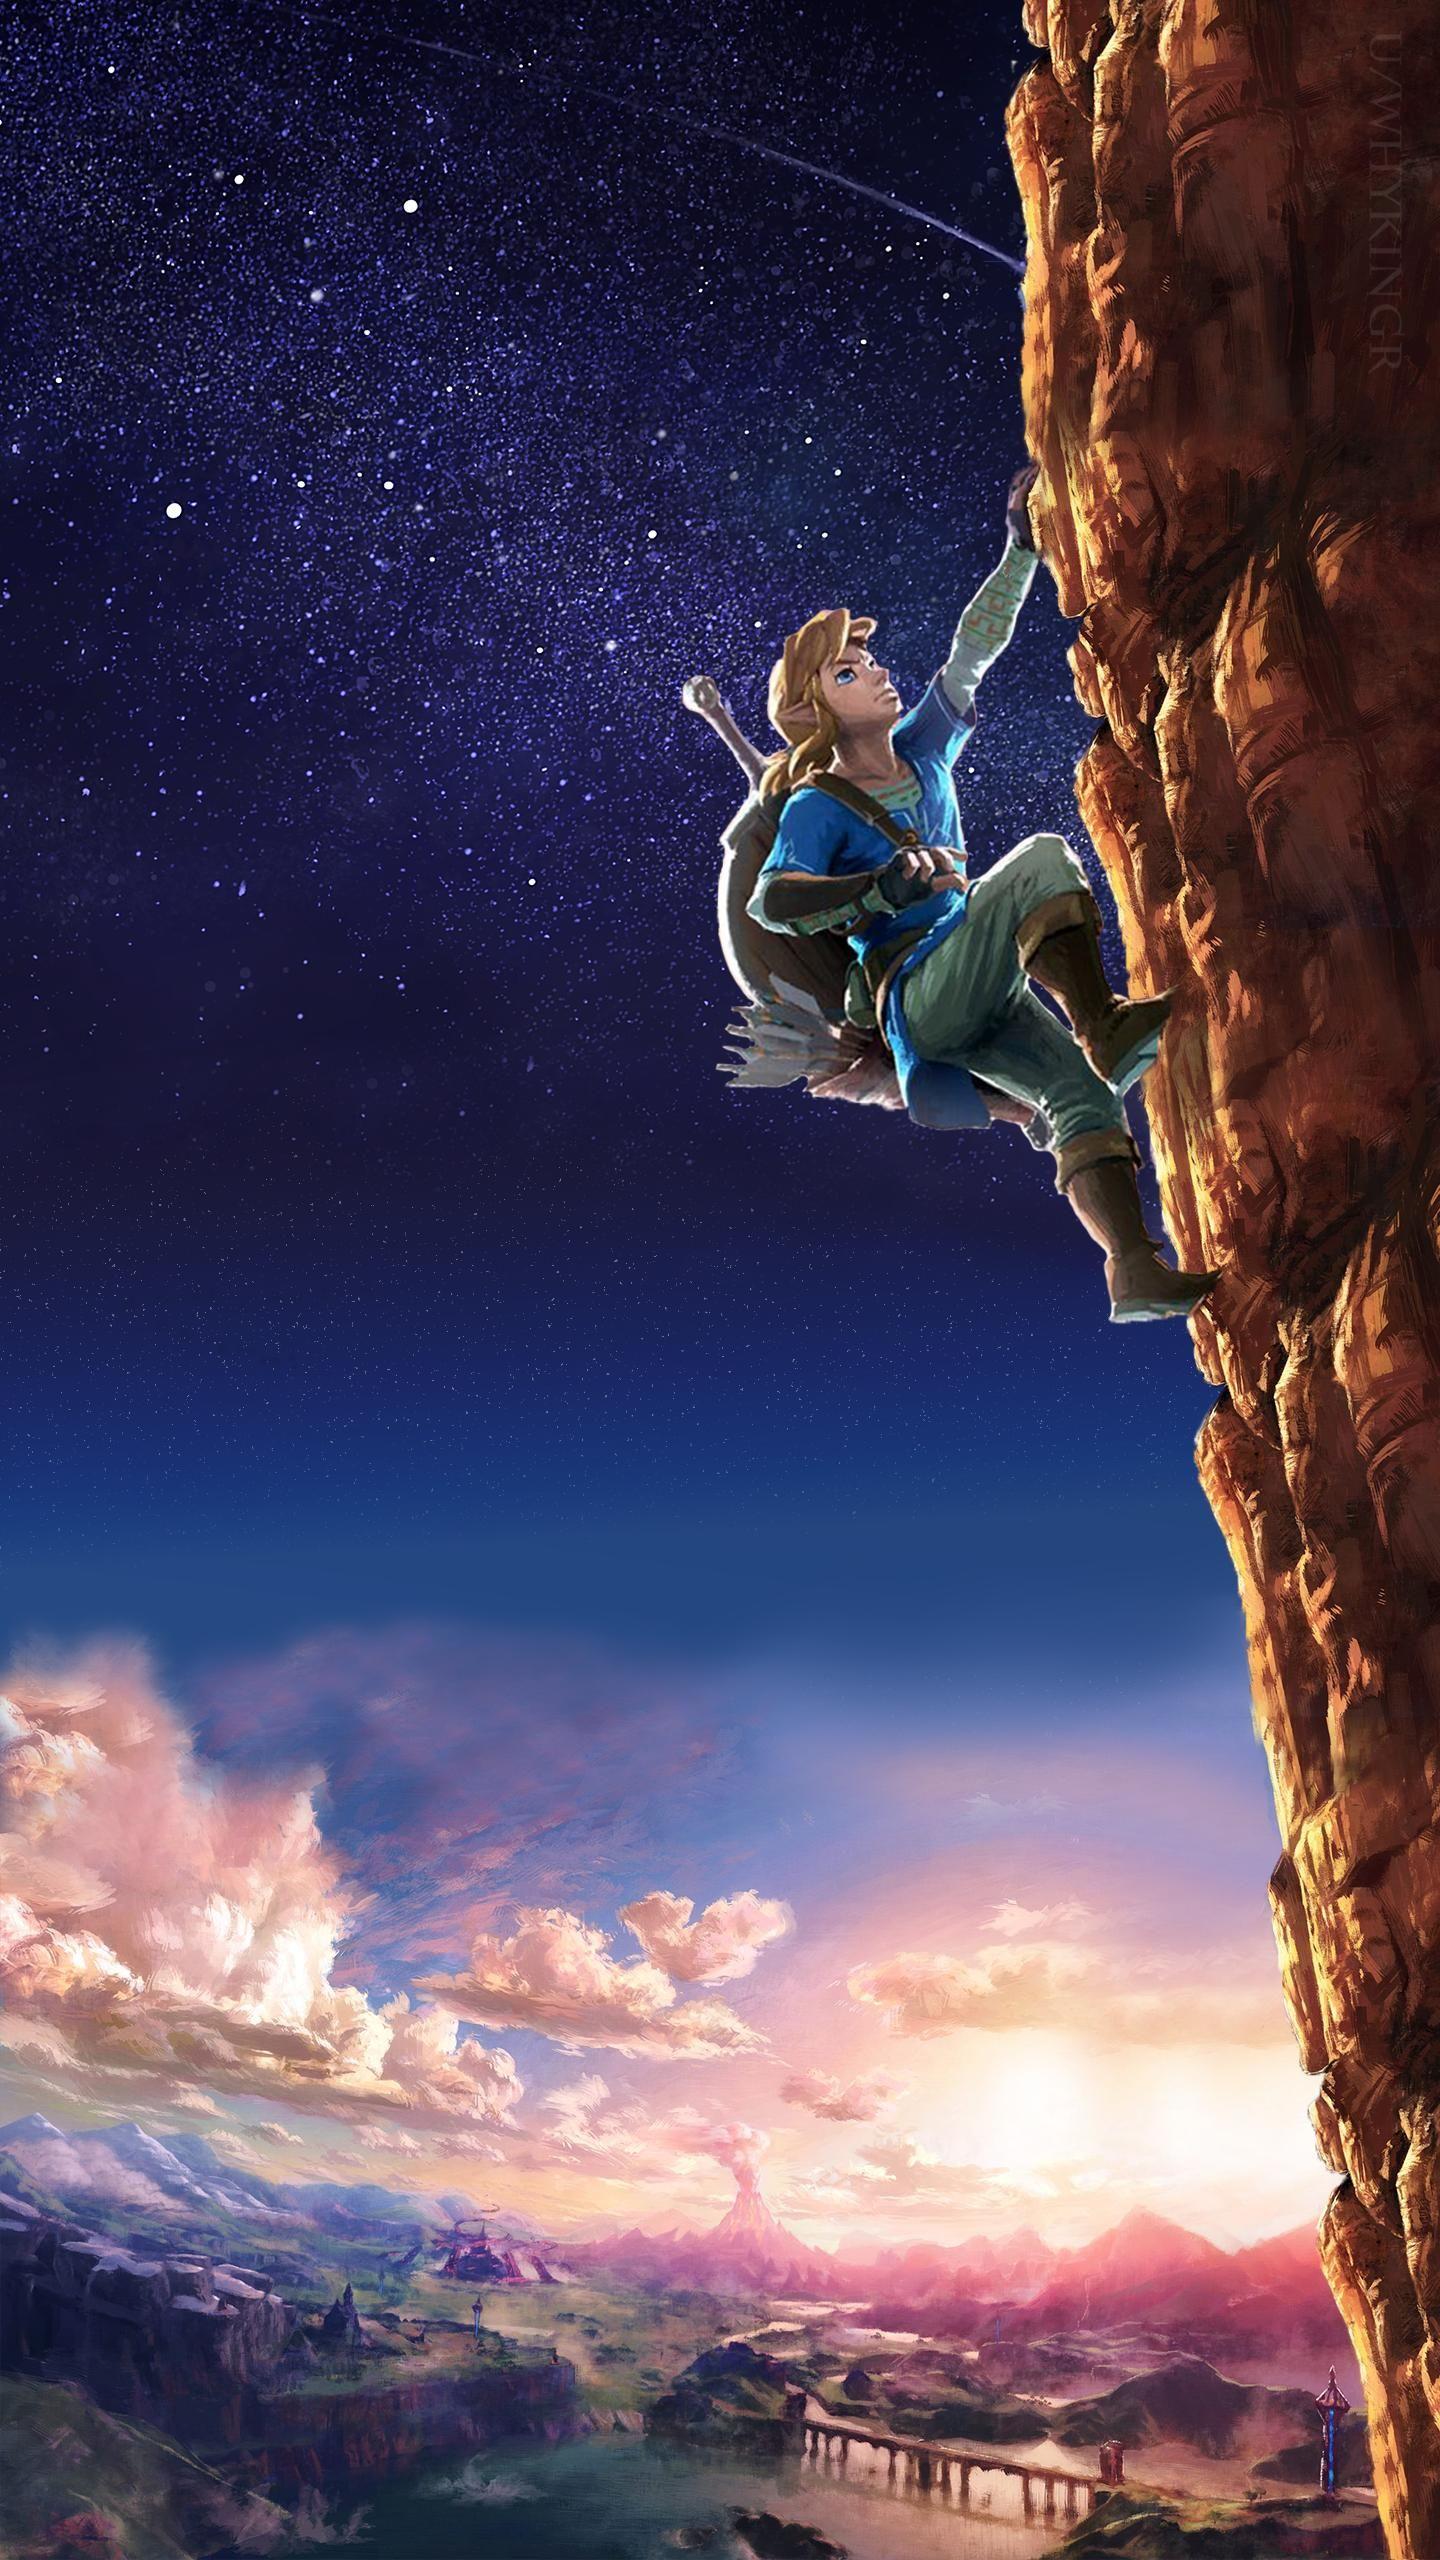 Free Download Zelda Breath Of The Wild Phone Wallpapers Legend Of